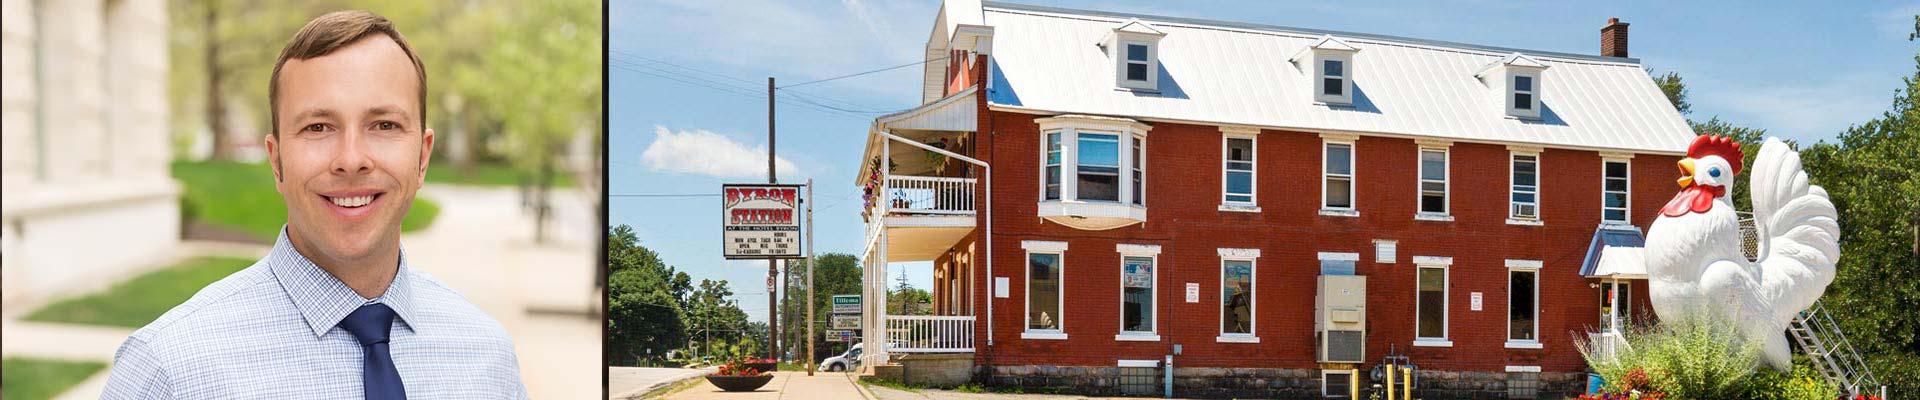 buy-a-home-in-byron-center-mi-homes-for-sale-byron-center-michigan-dave-kiel-realtor